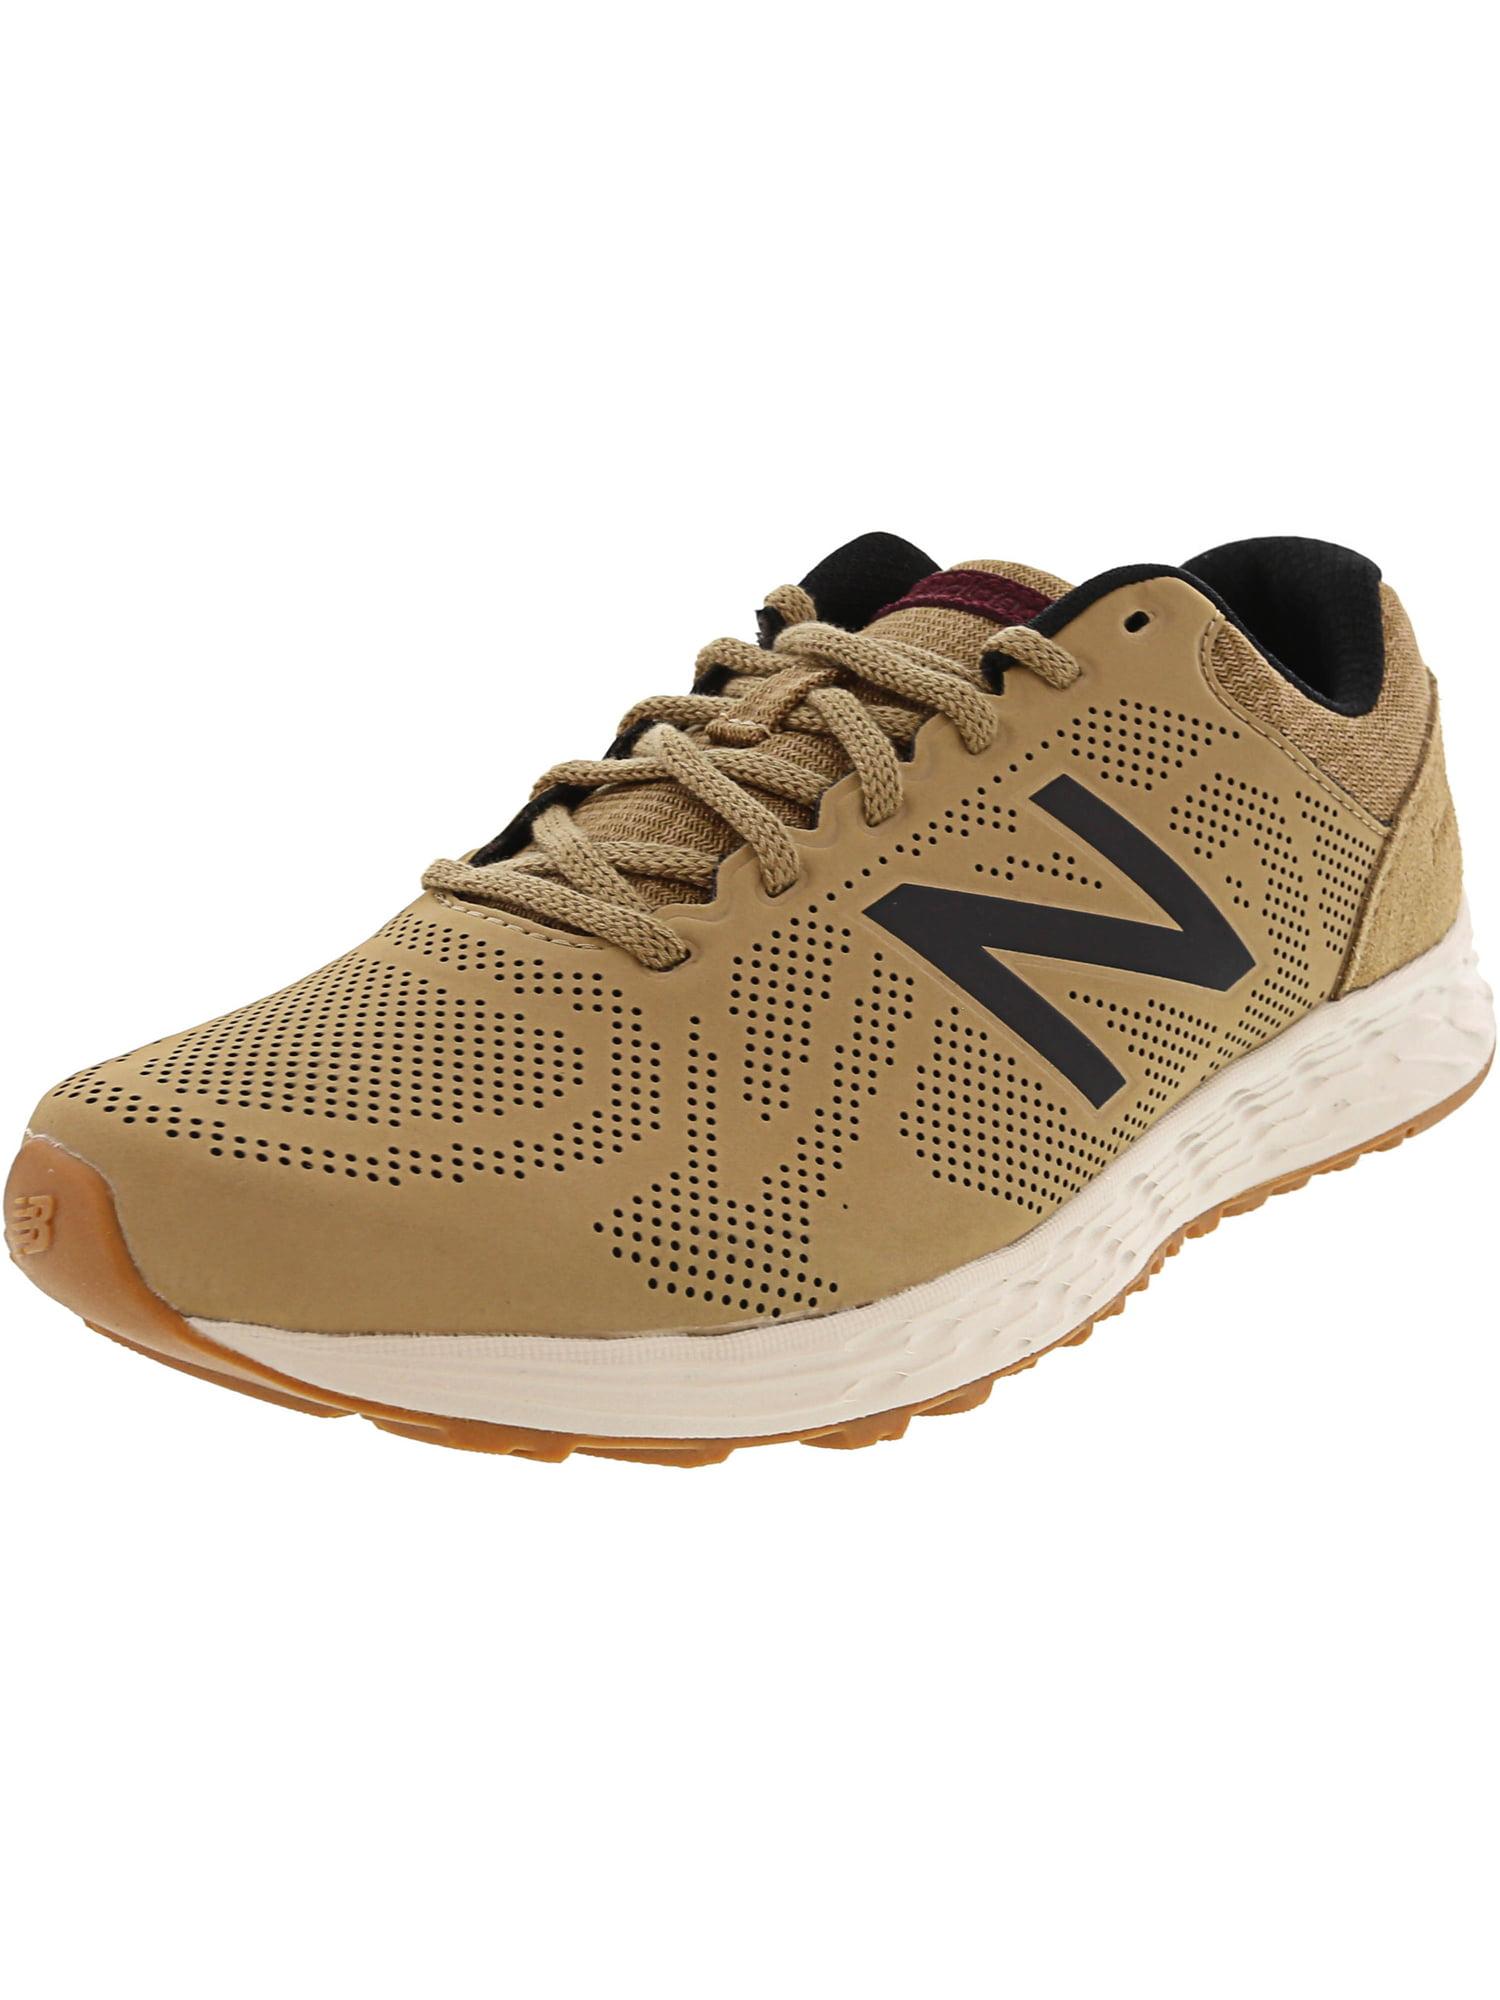 New Balance Mens Marislb1 Low Top Lace Up Running Sneaker